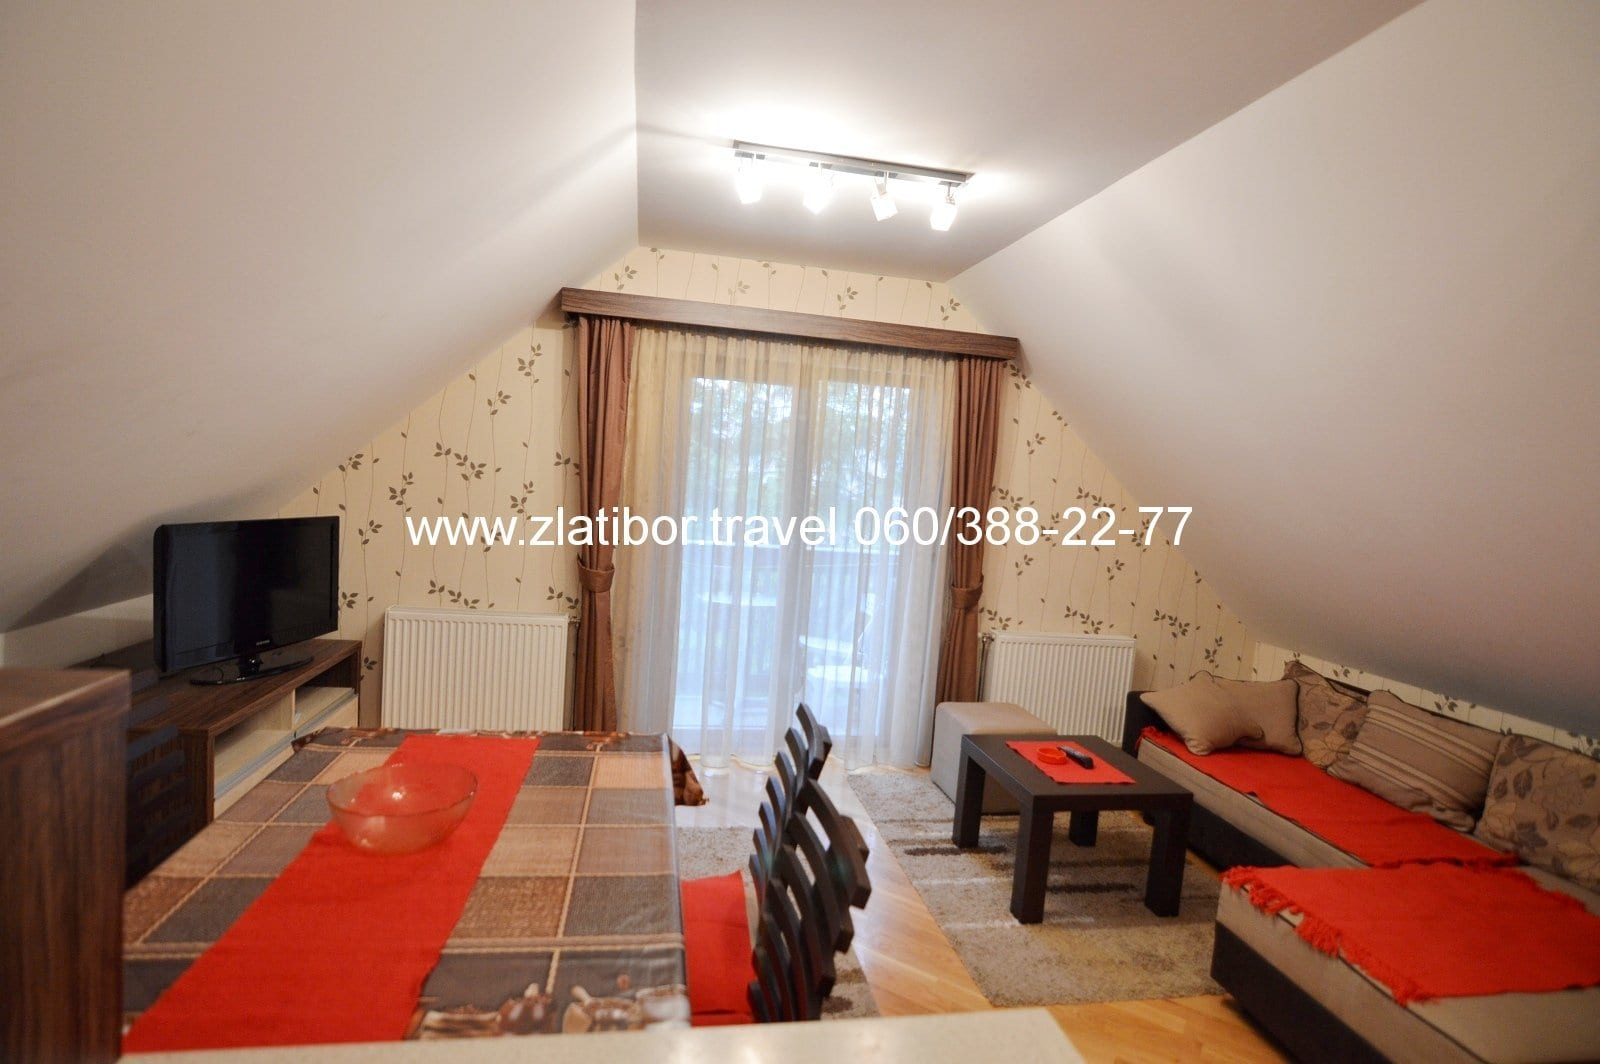 Apartman Modena Zlatibor Smeštaj Apartmani